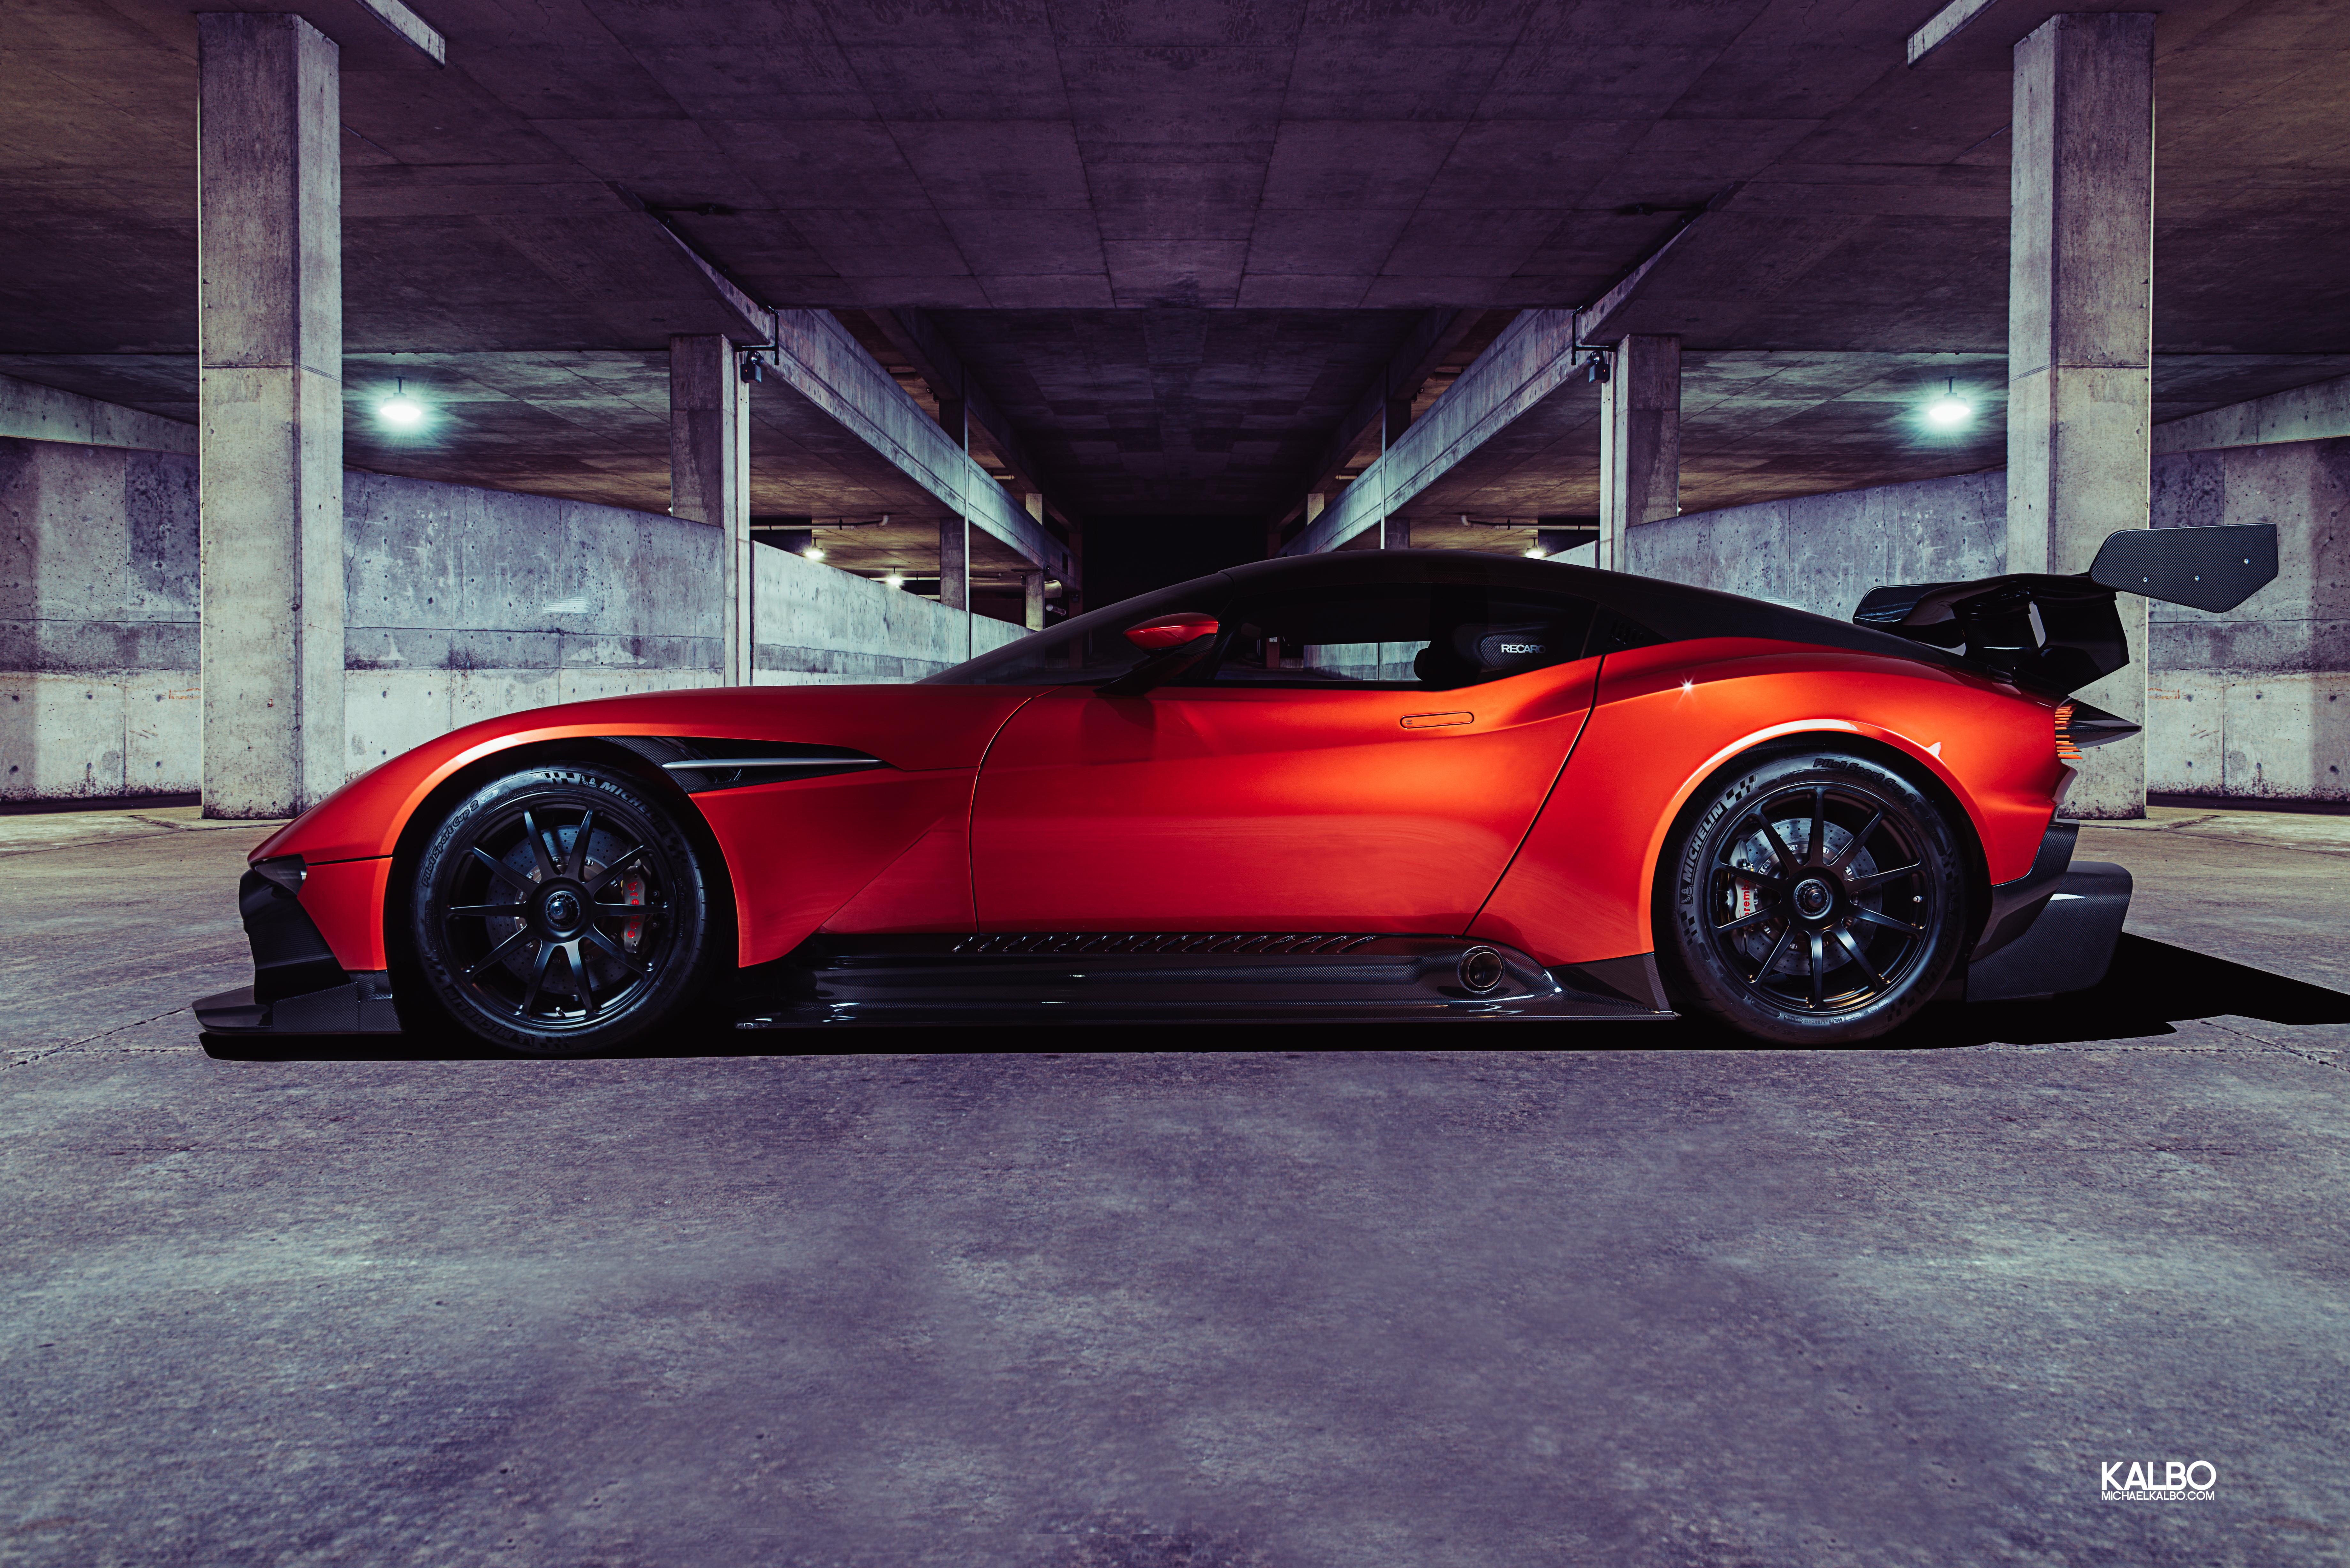 Aston-Martin-Vulcan-x-Michael-KALBO-5 (1)